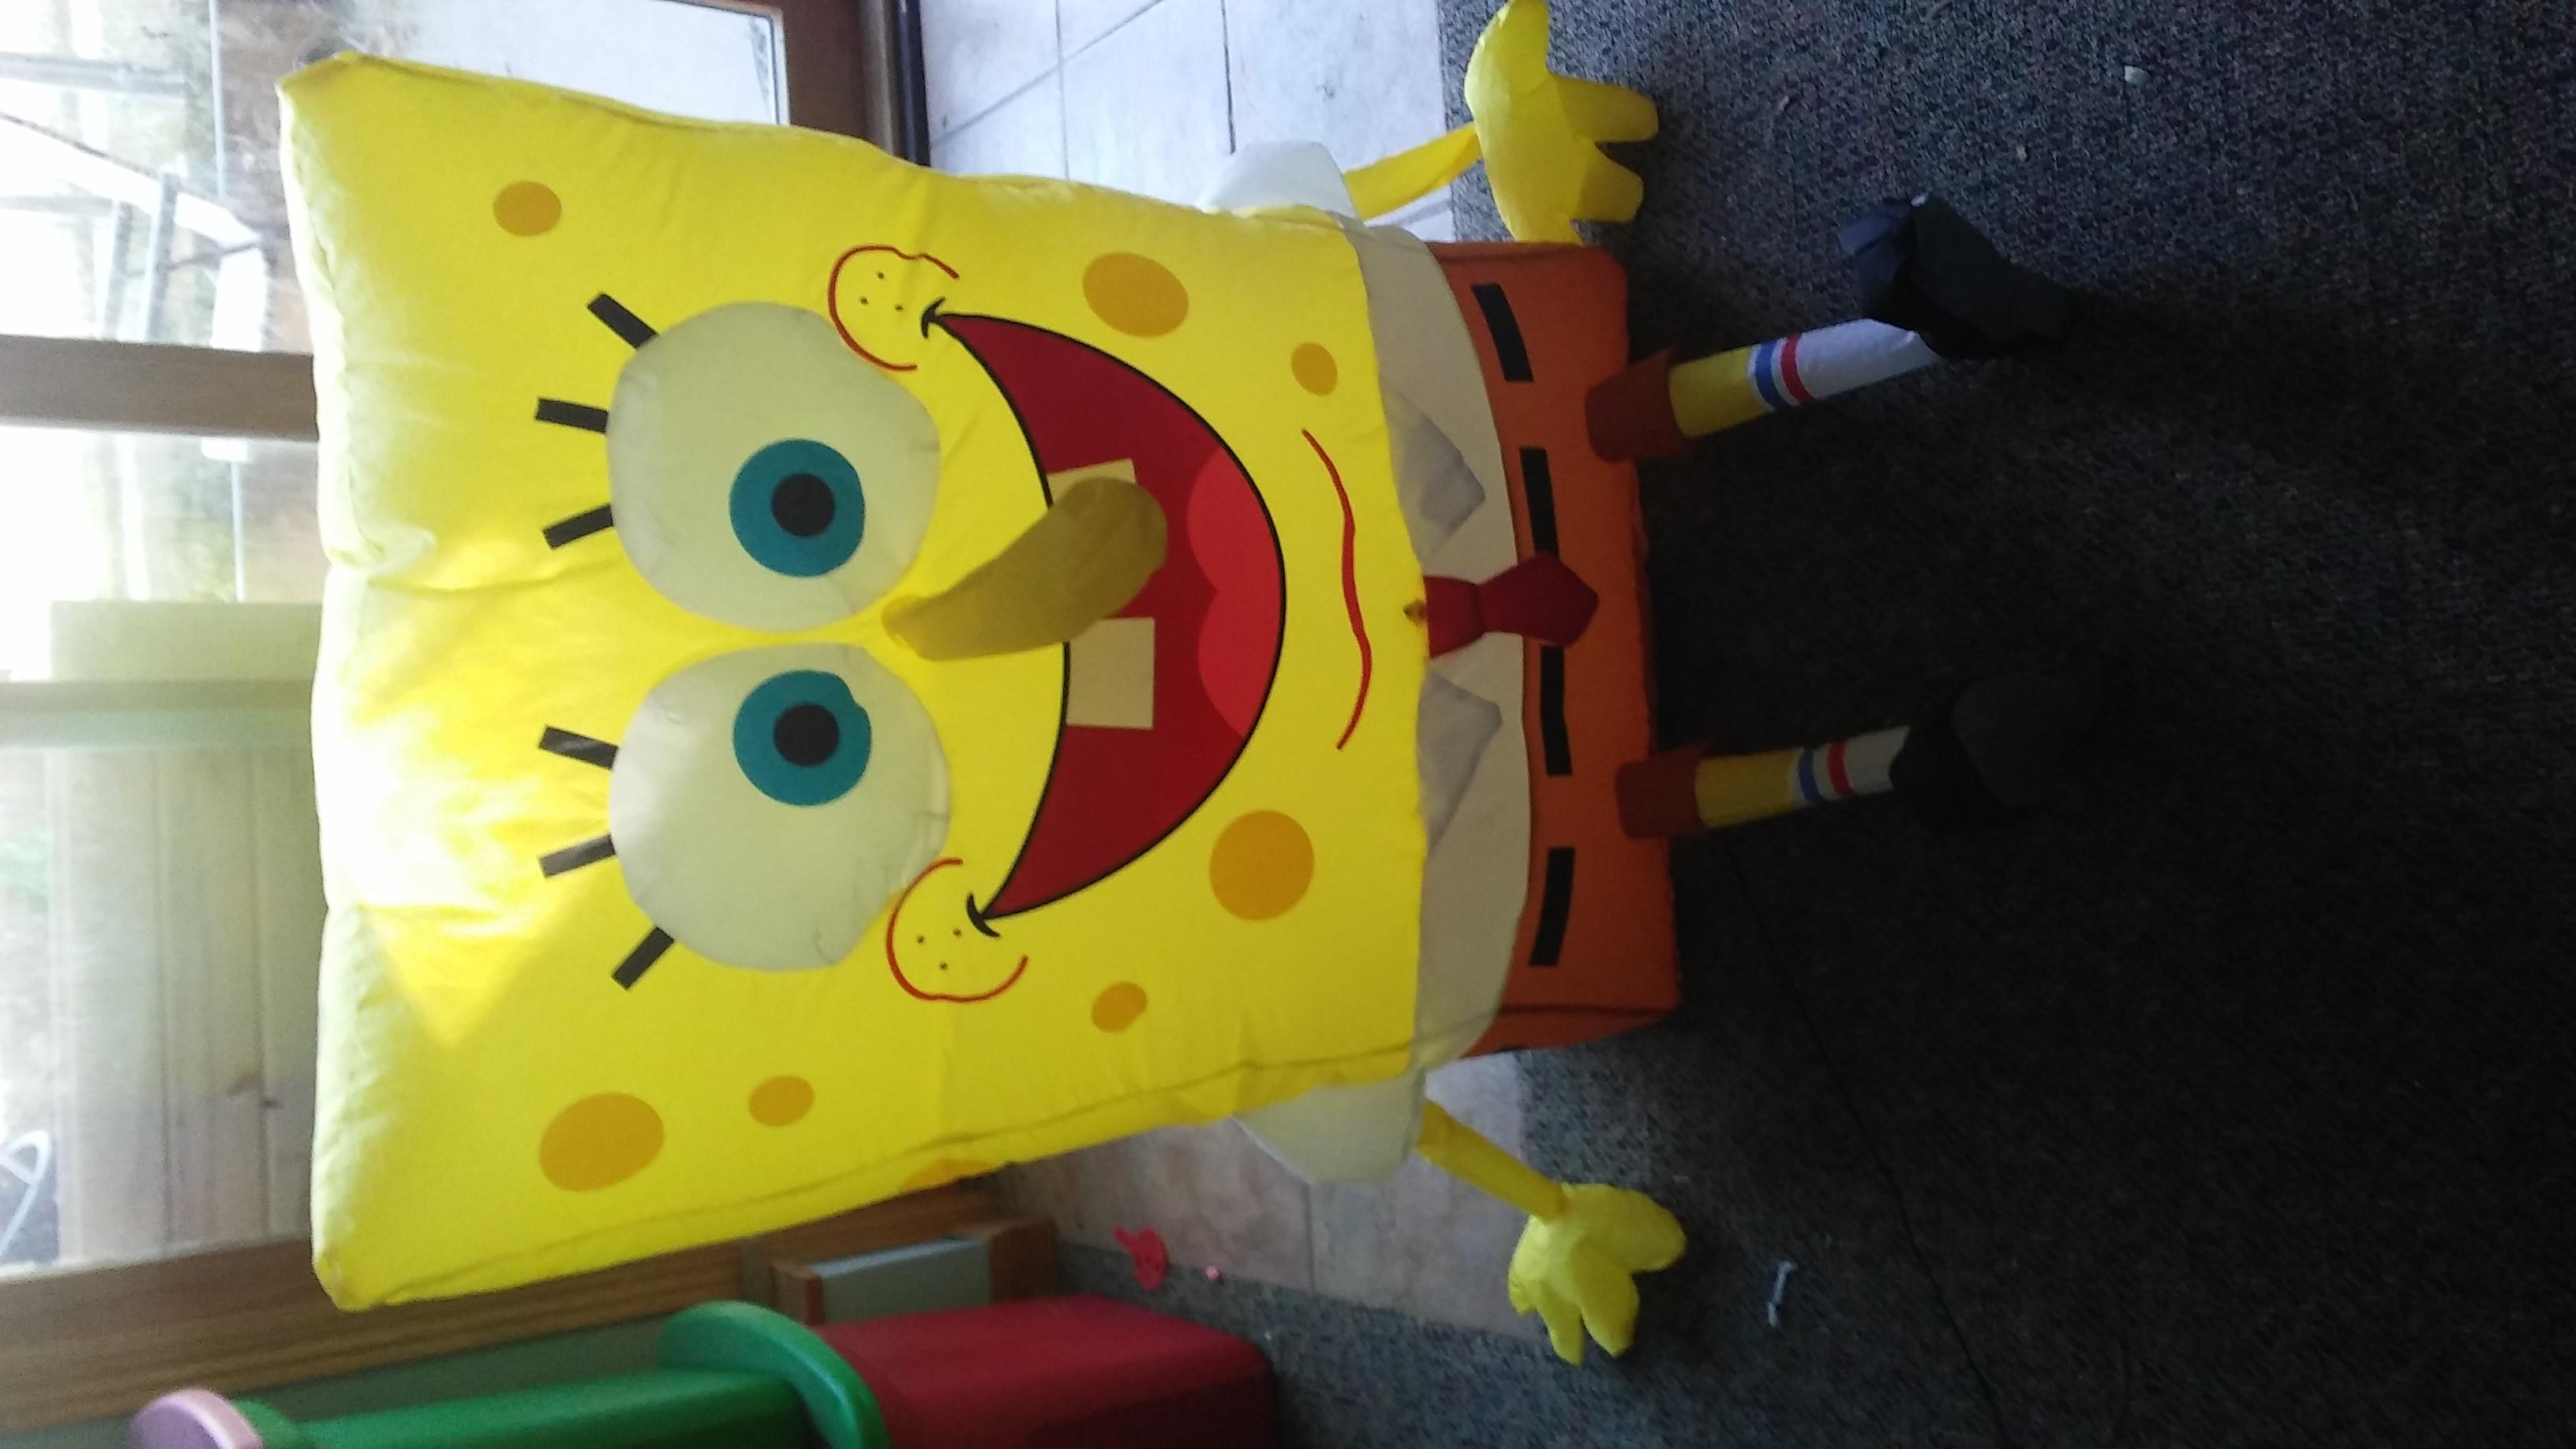 Talking Inflatable spongebob